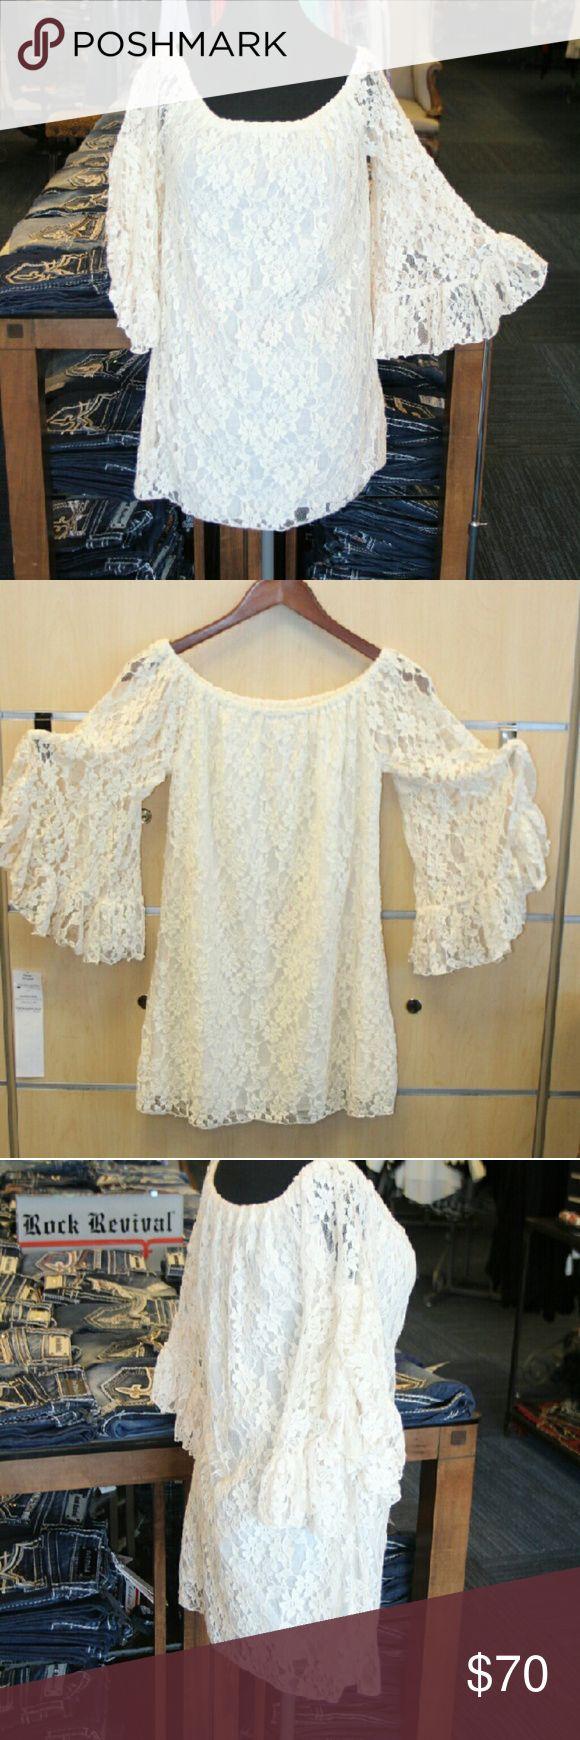 Elan Flower lace Cream Mini Dress with Ruffles Elan flower lace cream/white mini dress/skirt with ruffles ocer sized sleeves, elastic neck band 80% cotton 20%nylon lining 100% rayon Elan Dresses